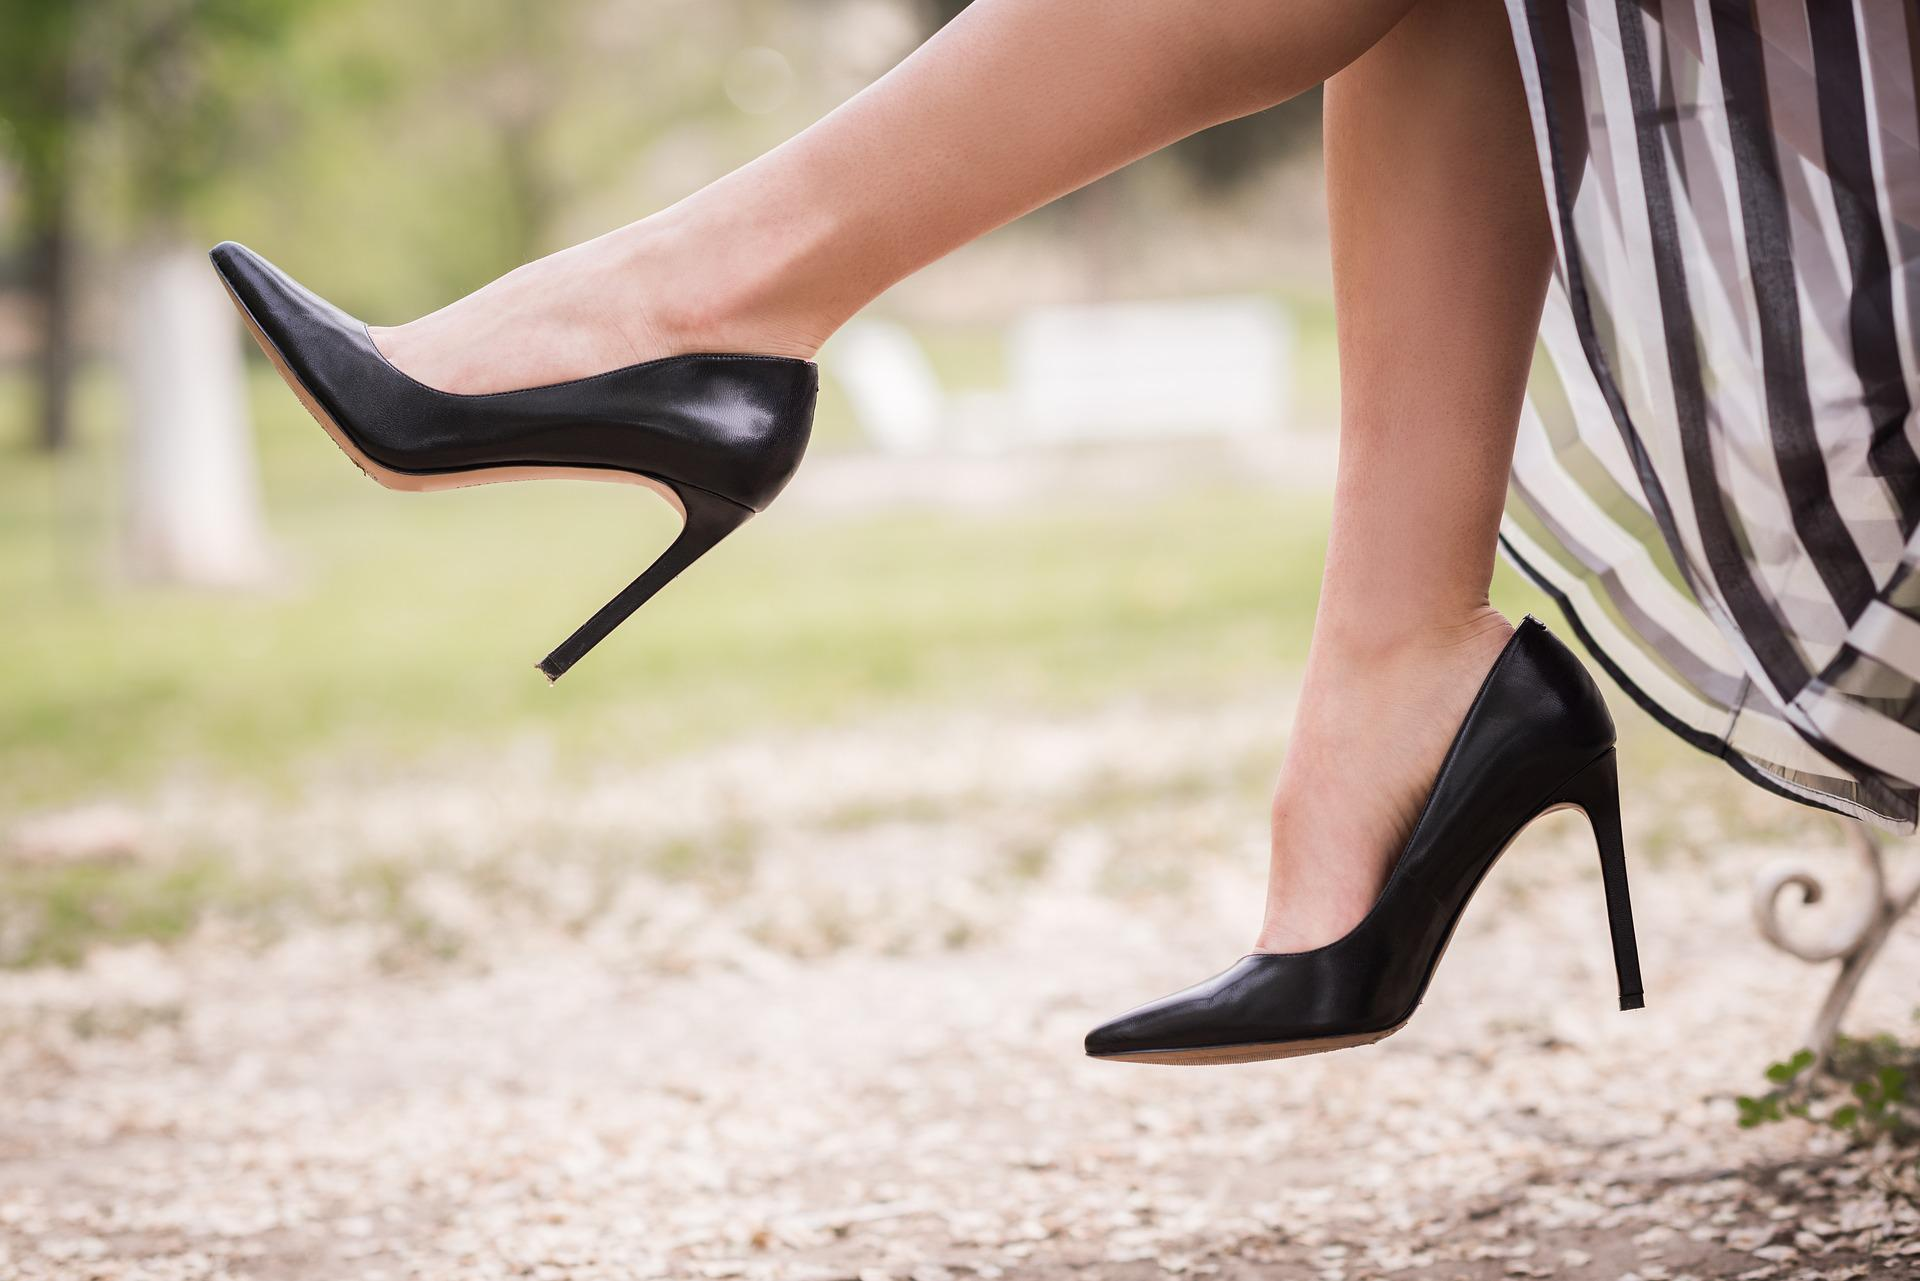 Jak dobrać kolor butów do stylizacji?